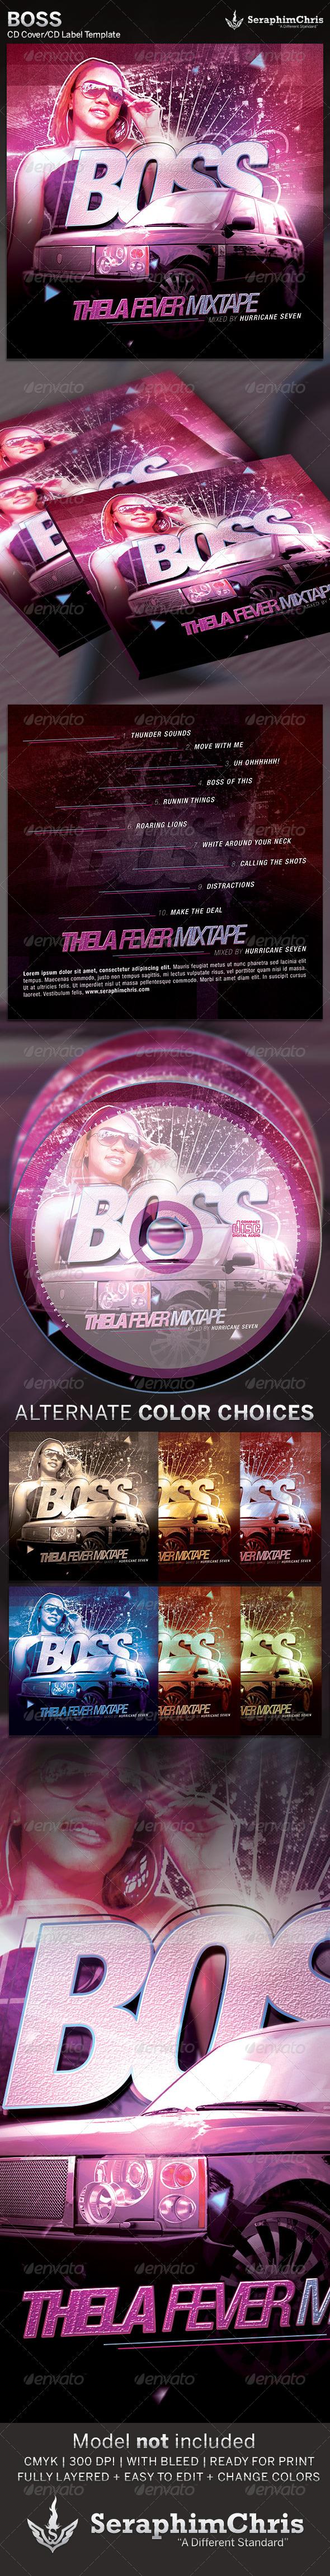 Boss: CD Cover Artwork Template - CD & DVD Artwork Print Templates